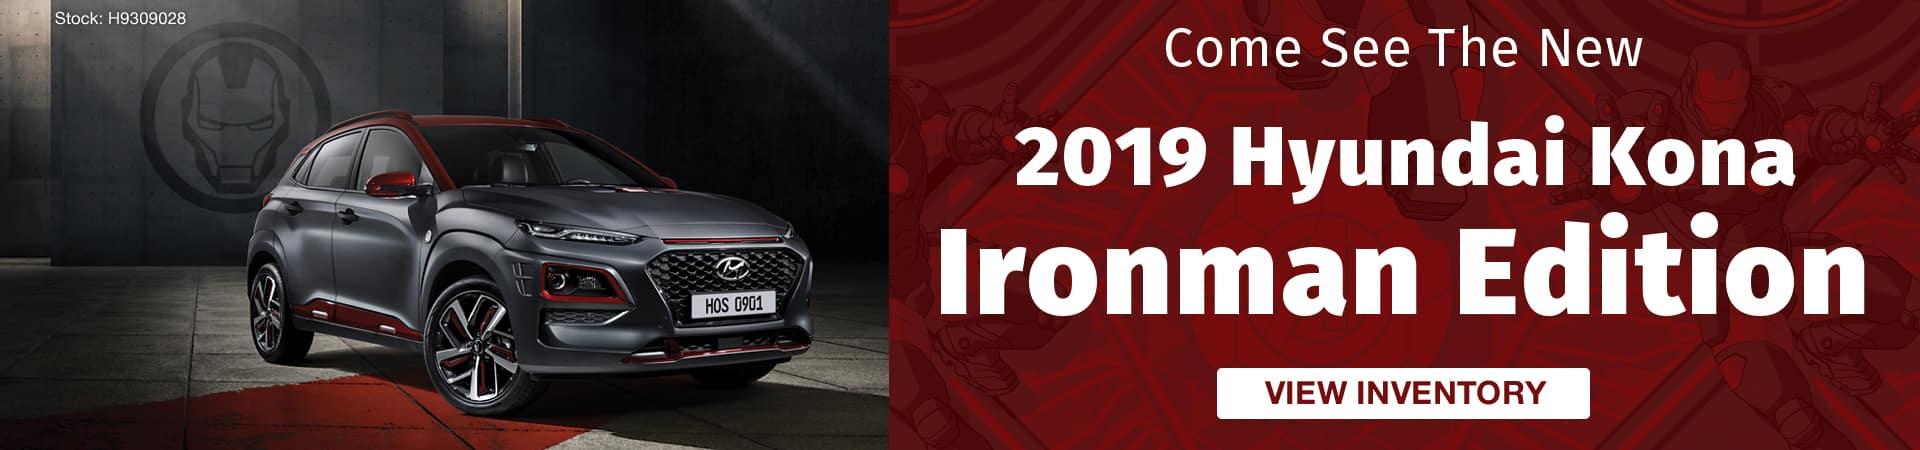 Check out the new 2019 Hyundai Kona Ironman Edition in Murfreesboro TN